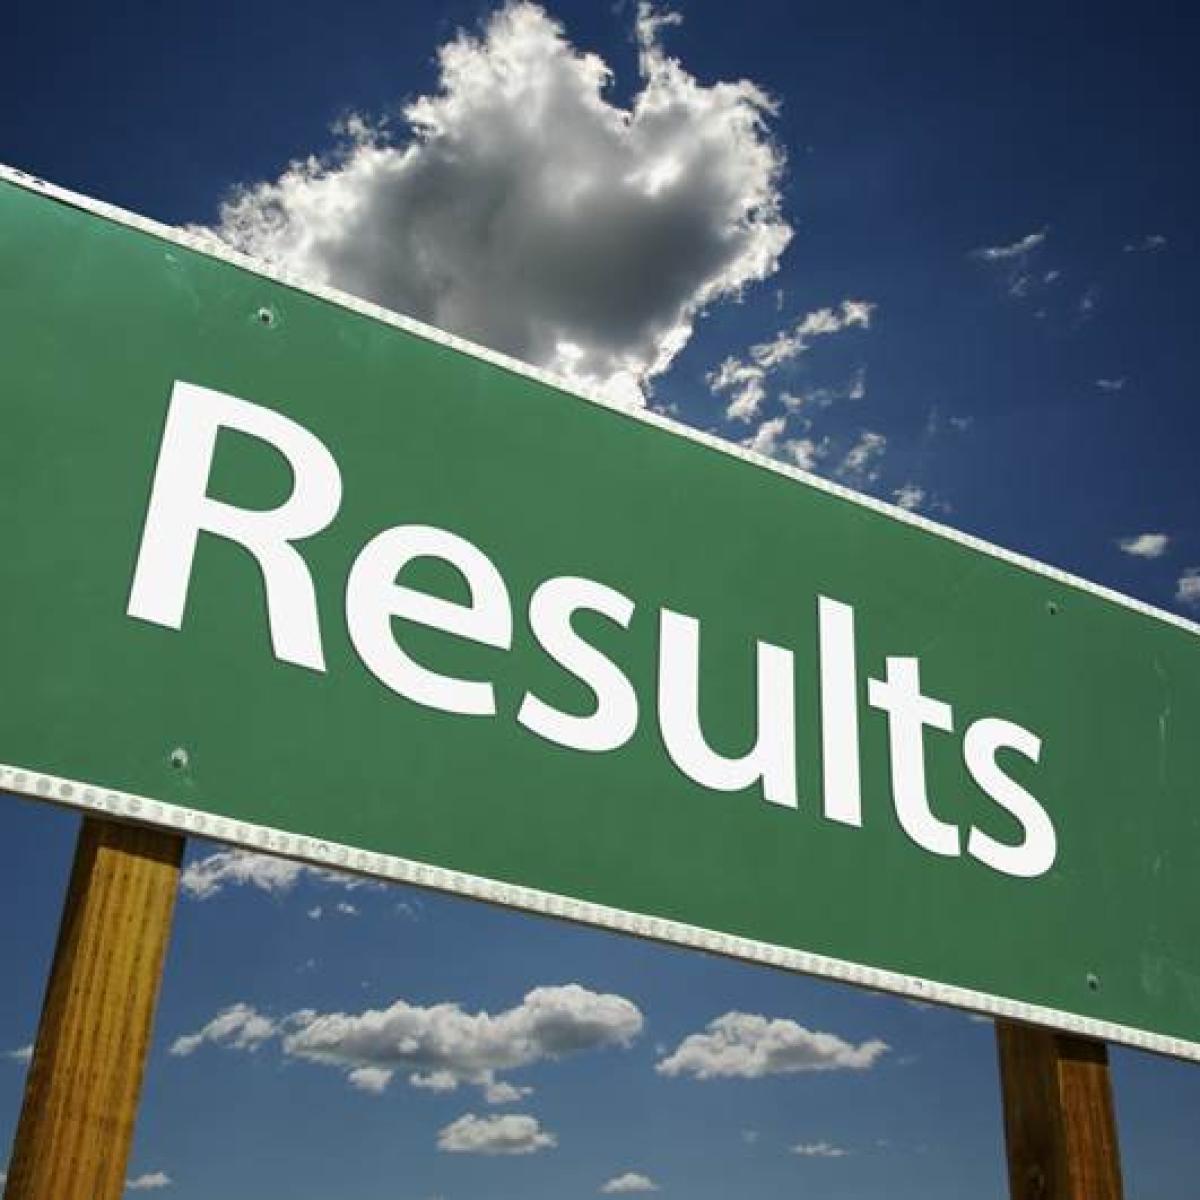 TNTEU B.Sc, B.Ed results 2019 declared; check at tnteu.ac.in